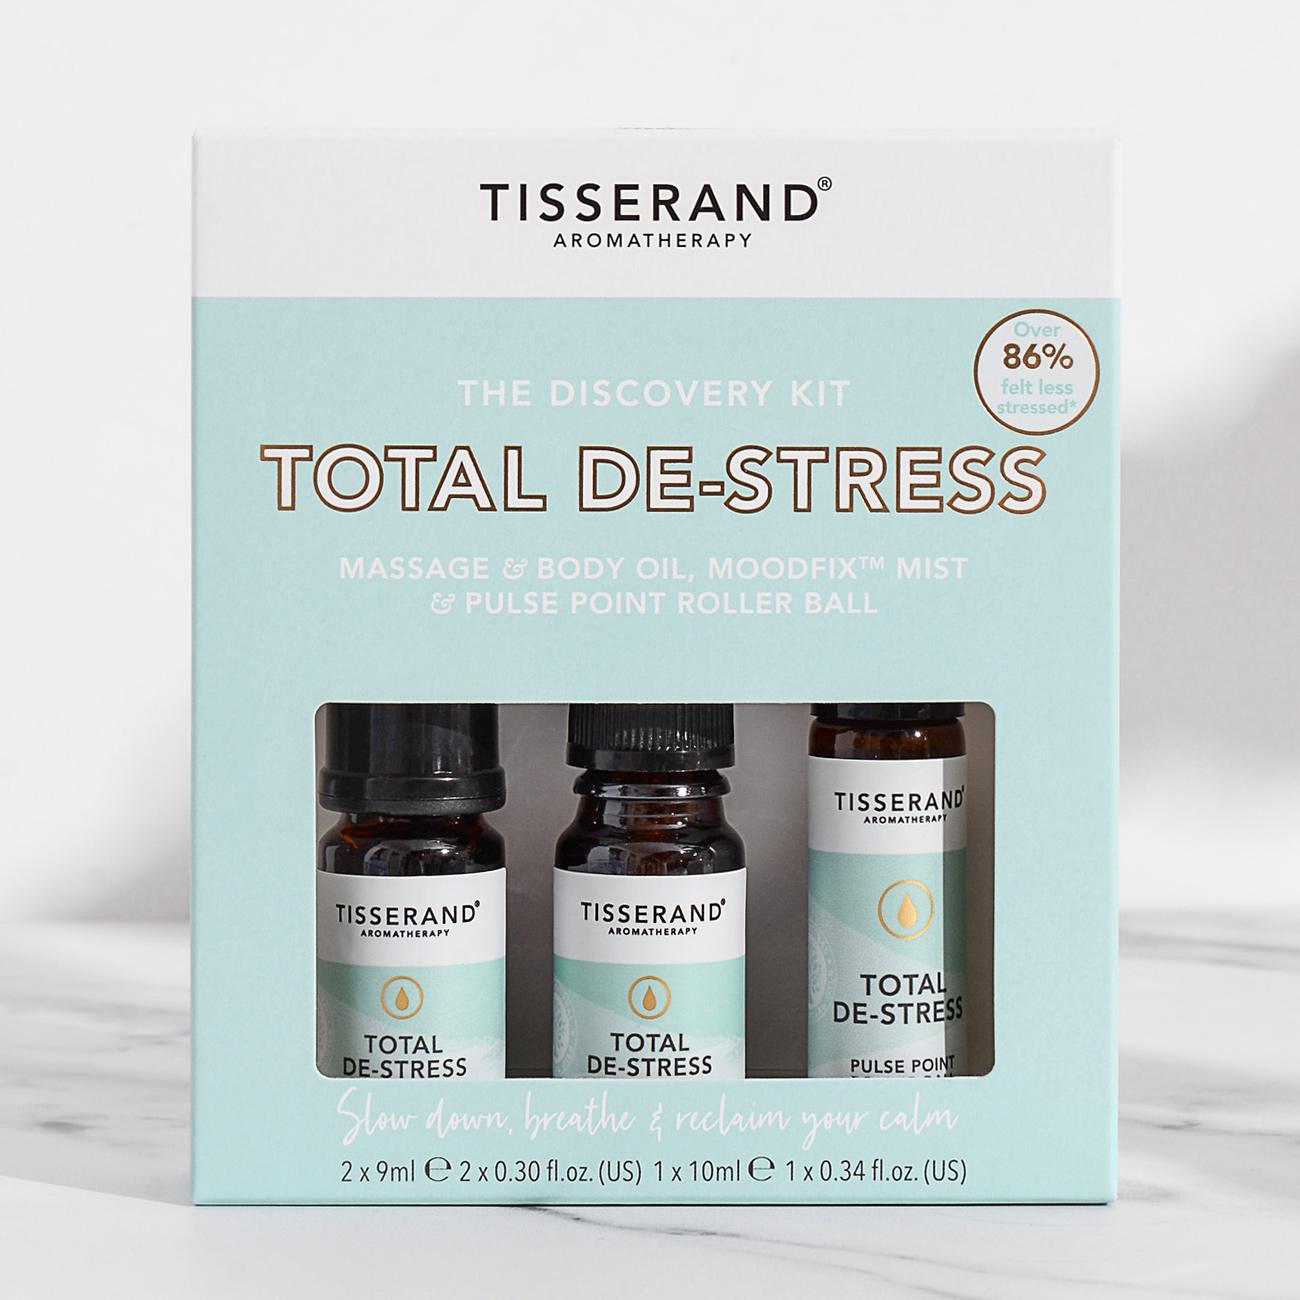 Tisserand - The Total De-Stress Discovery Kit